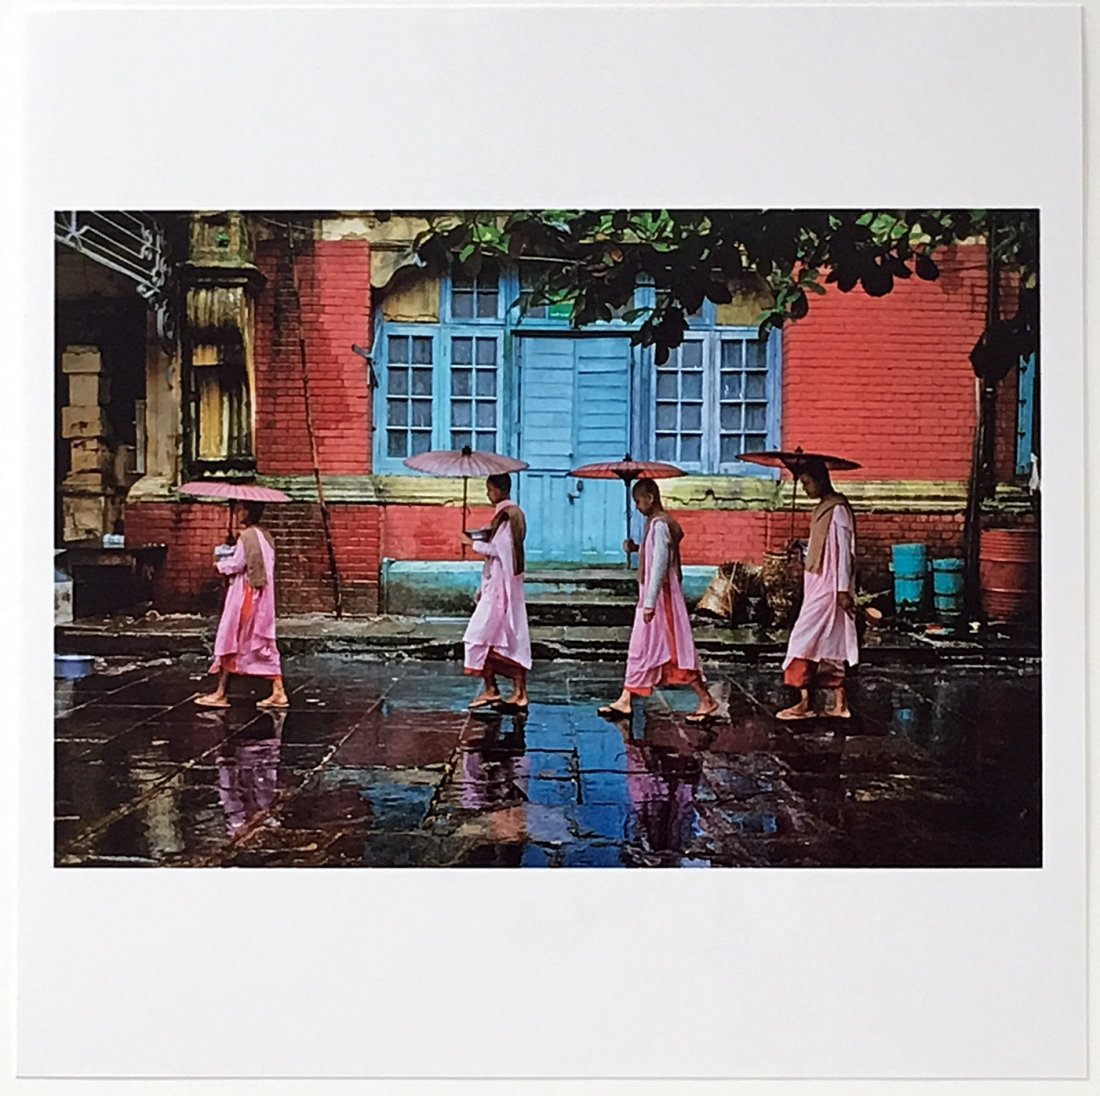 Steve McCurry: Procession of Nuns, Yangon, Myanmar 1994